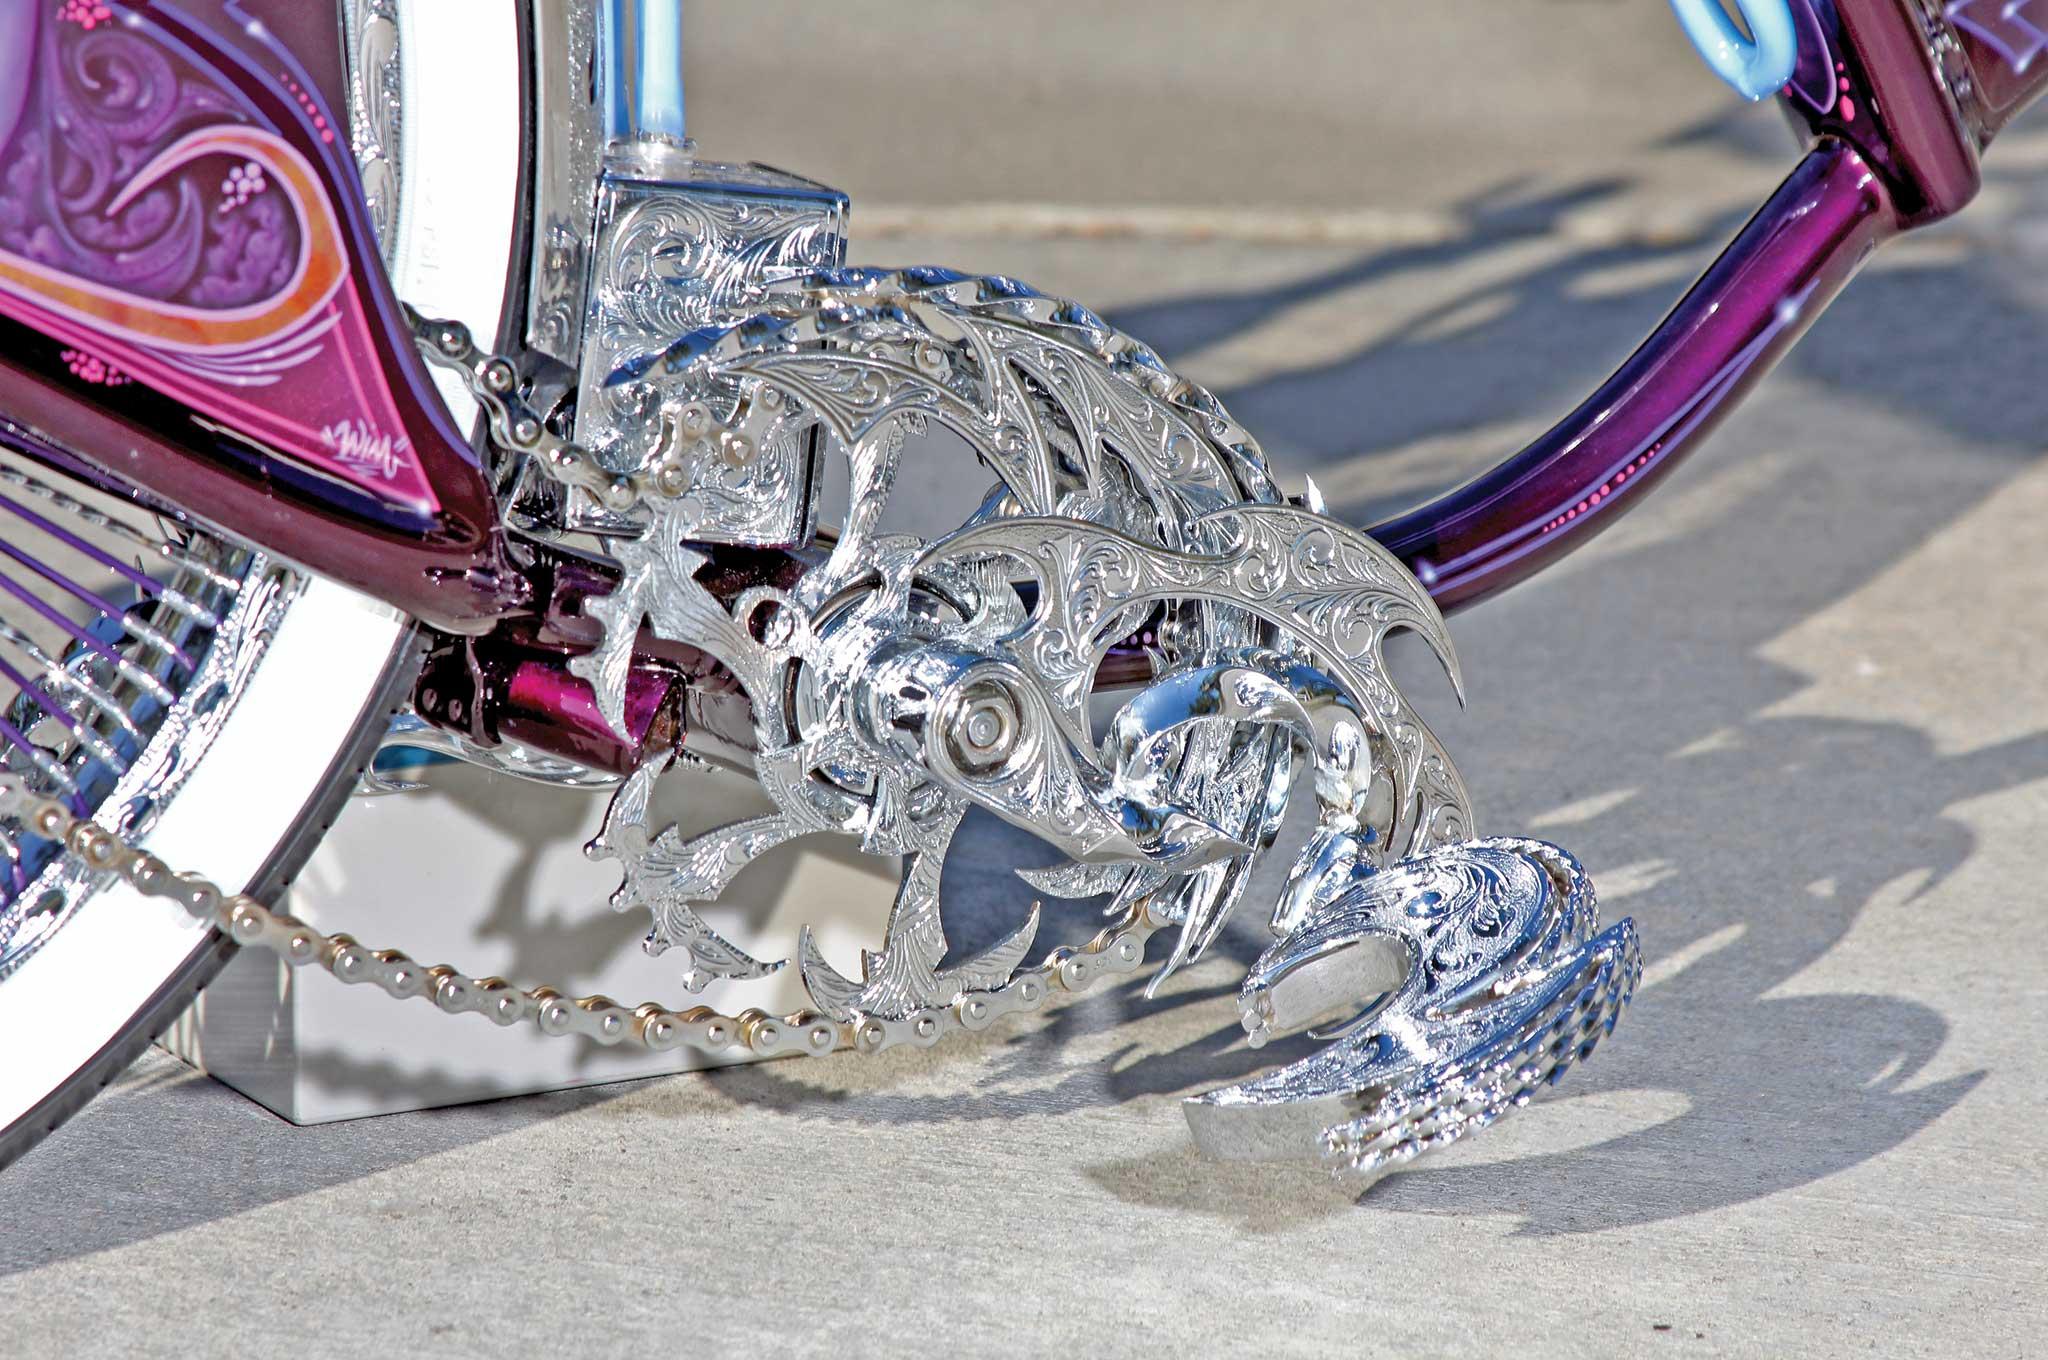 003 1967 schwinn bicycle custom pedal